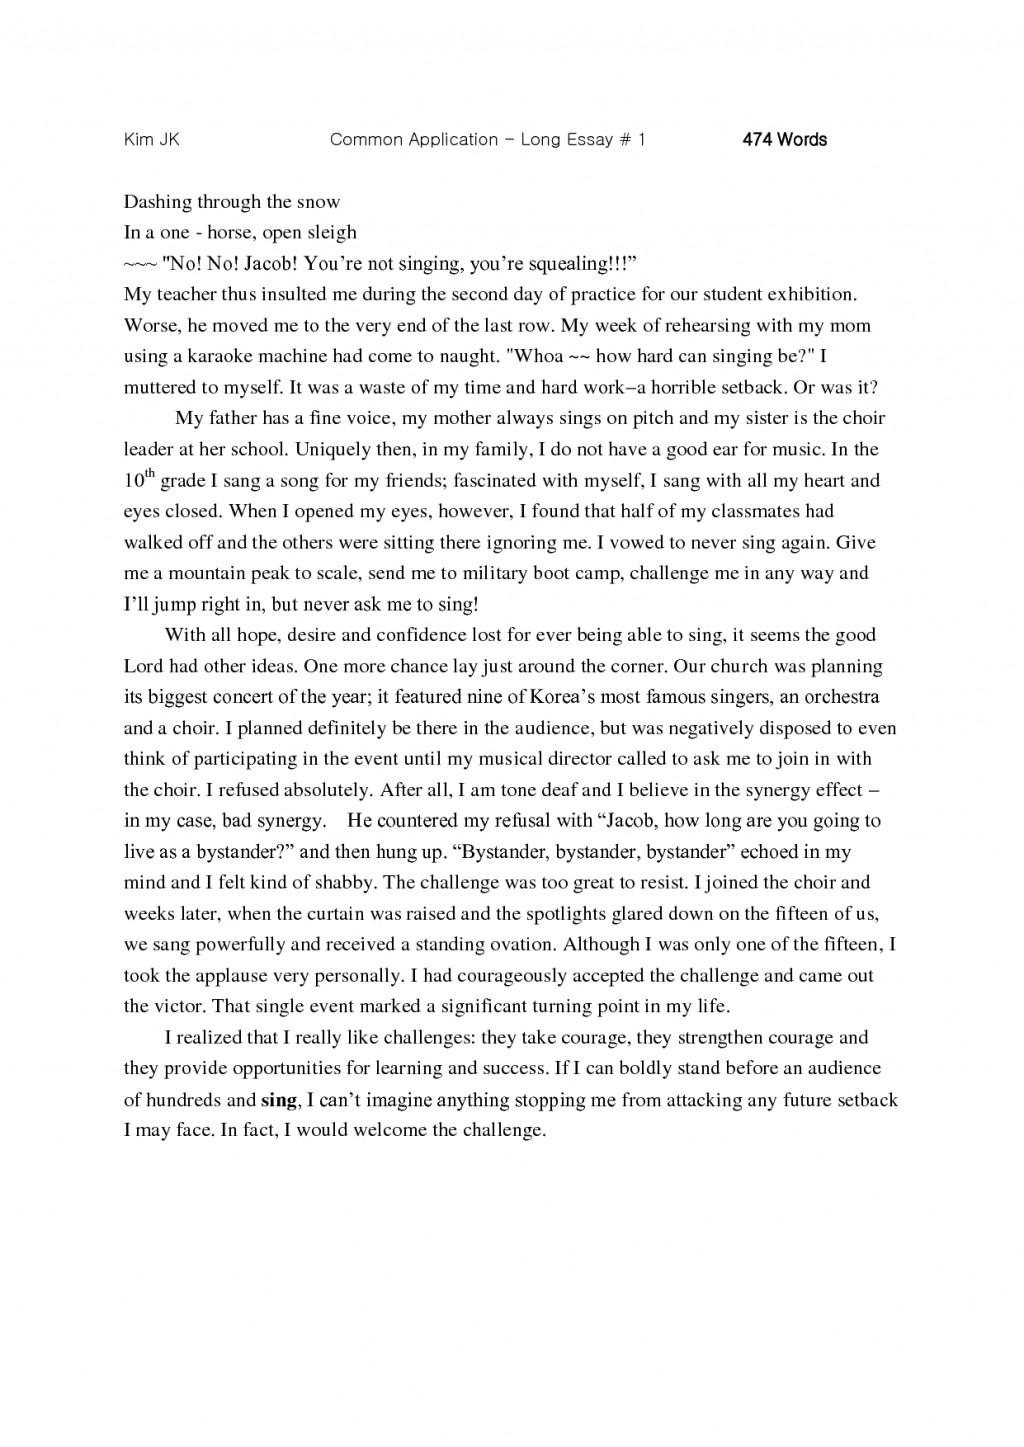 003 Essay Example How Many Common App Essays Do You Write Good Resume Writing Application Help Amazing Should Large